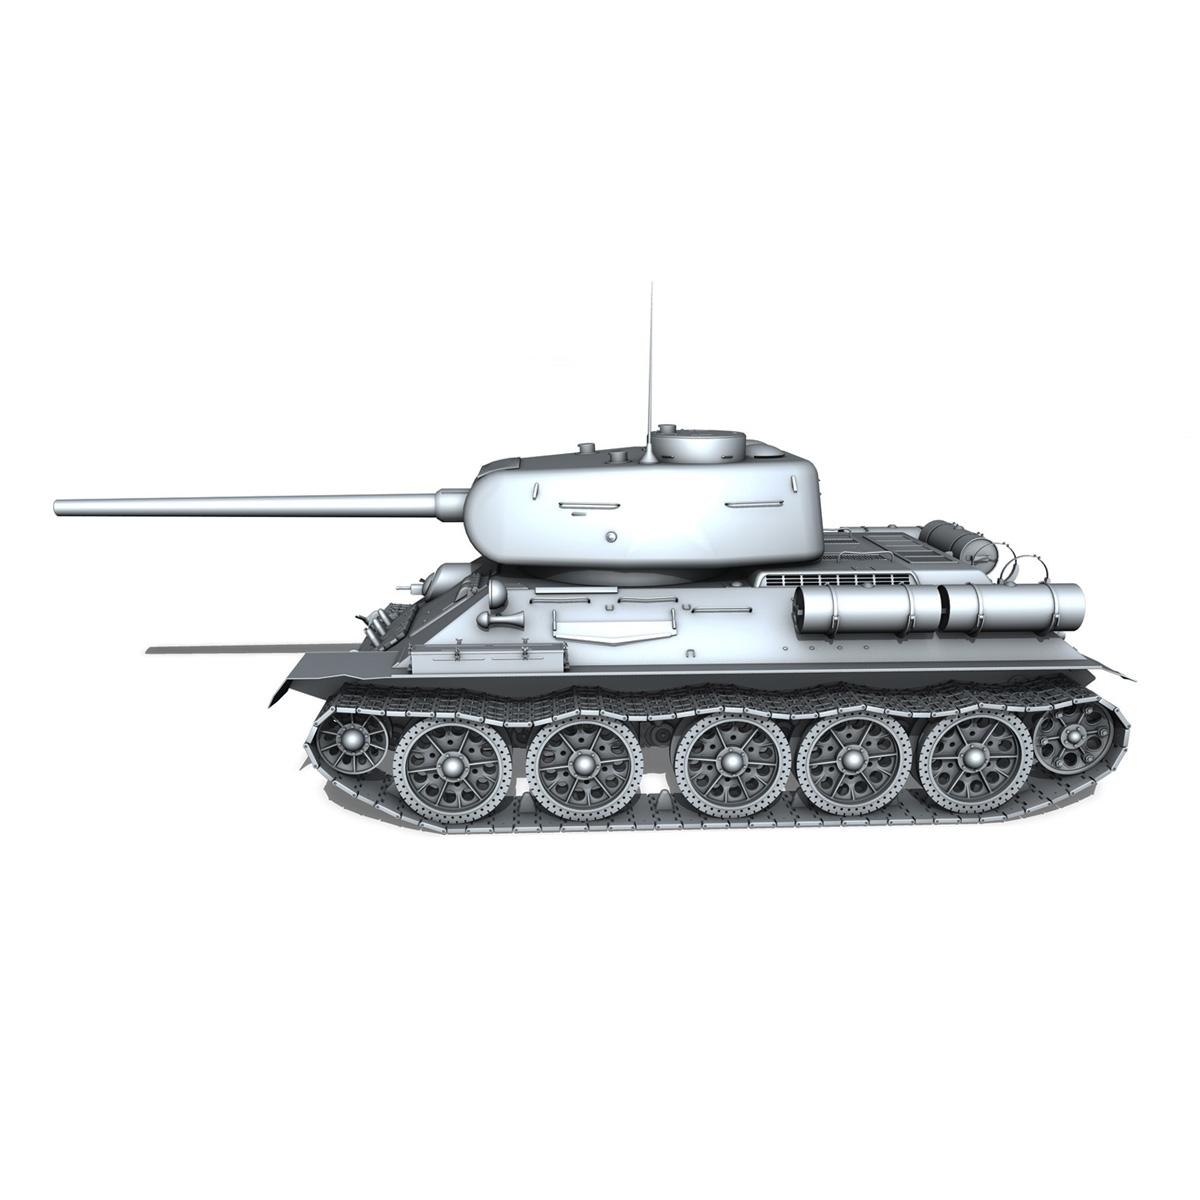 t-34 85 – soviet medium tank 3d model 3ds fbx lwo lw lws obj c4d 266410